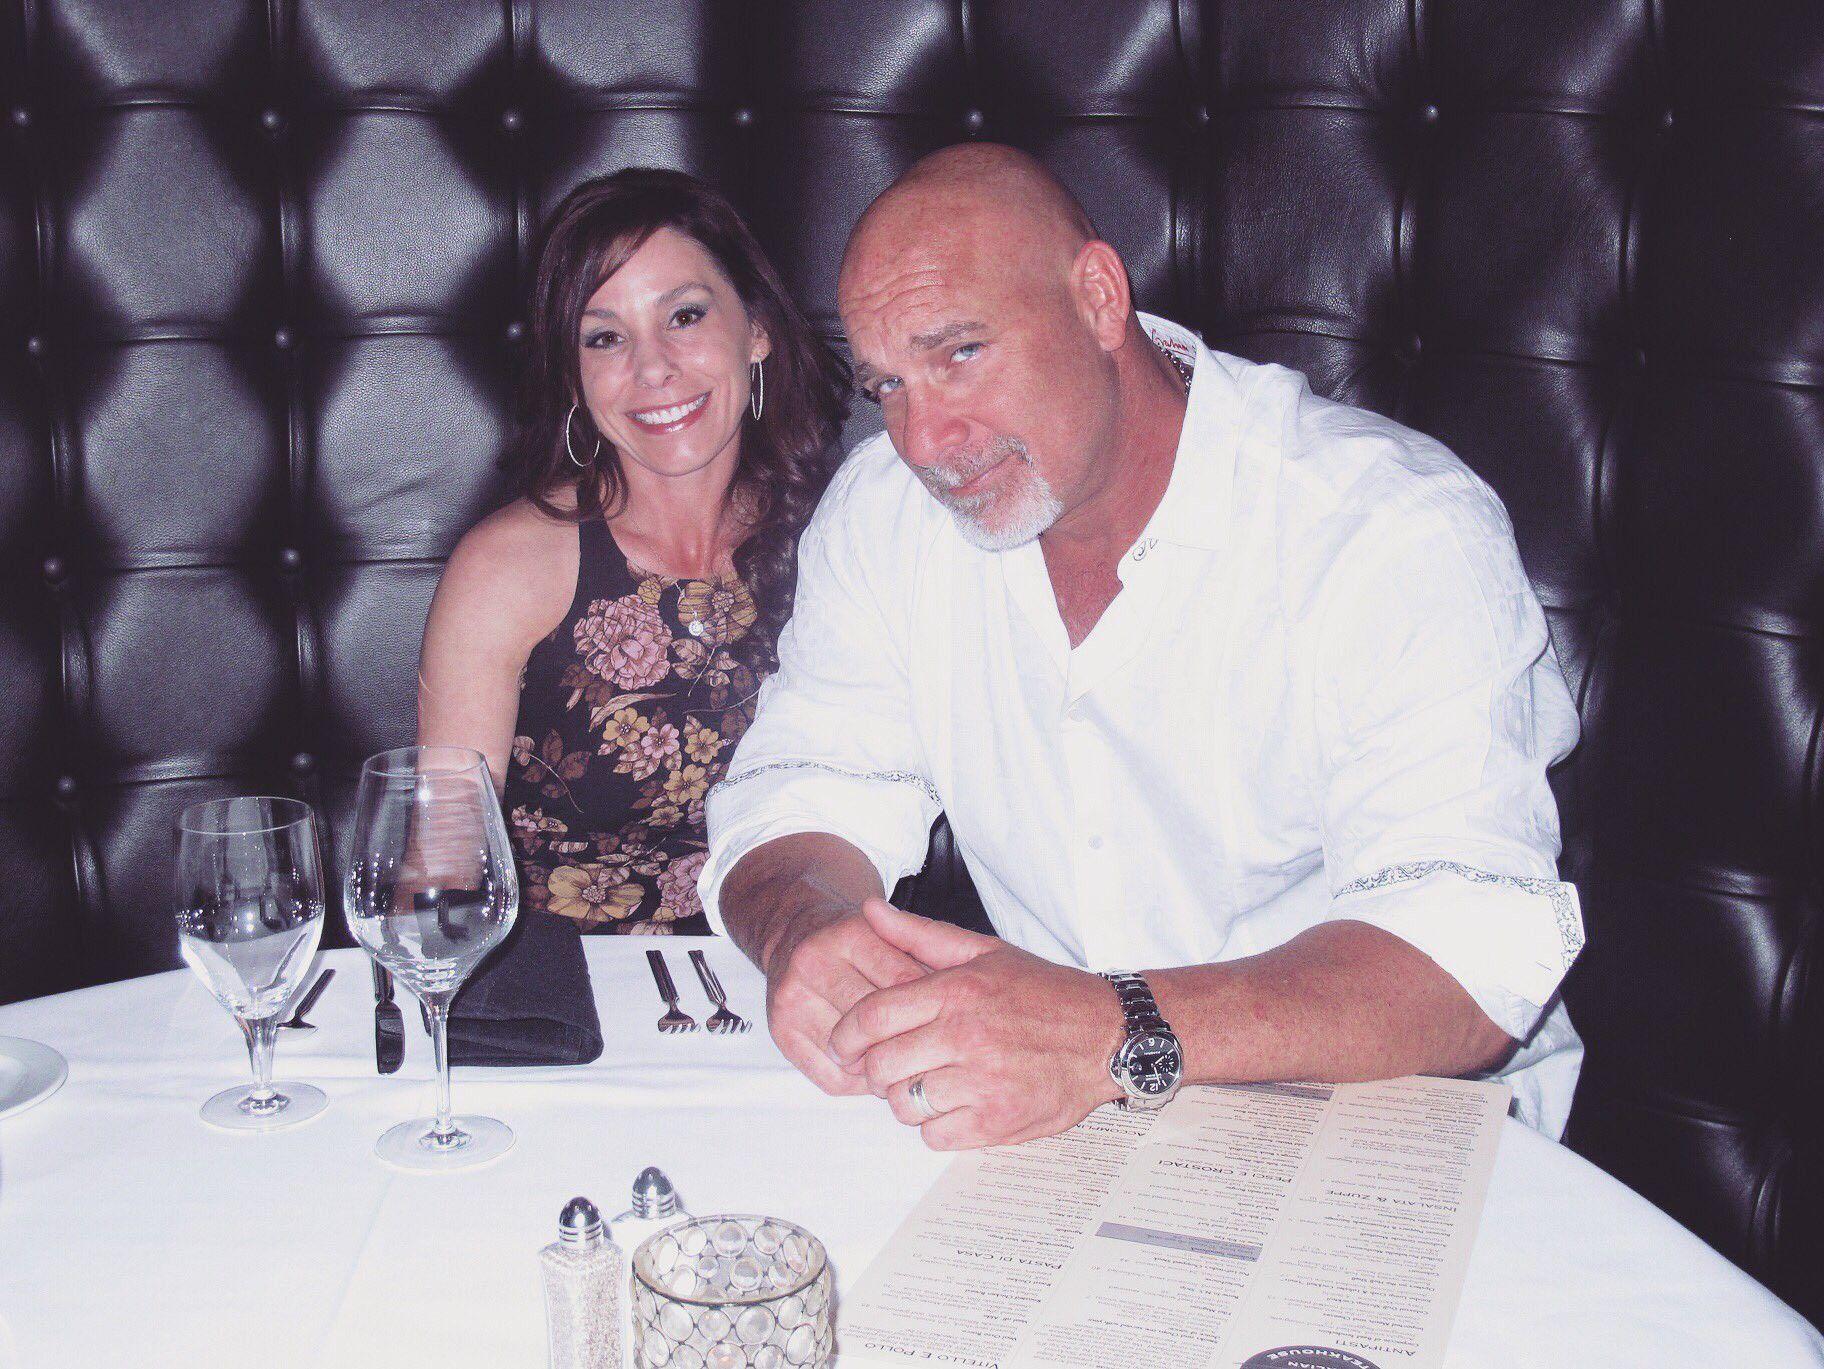 Goldberg & His Wife | Wwe couples, Wwe, Professional wrestling